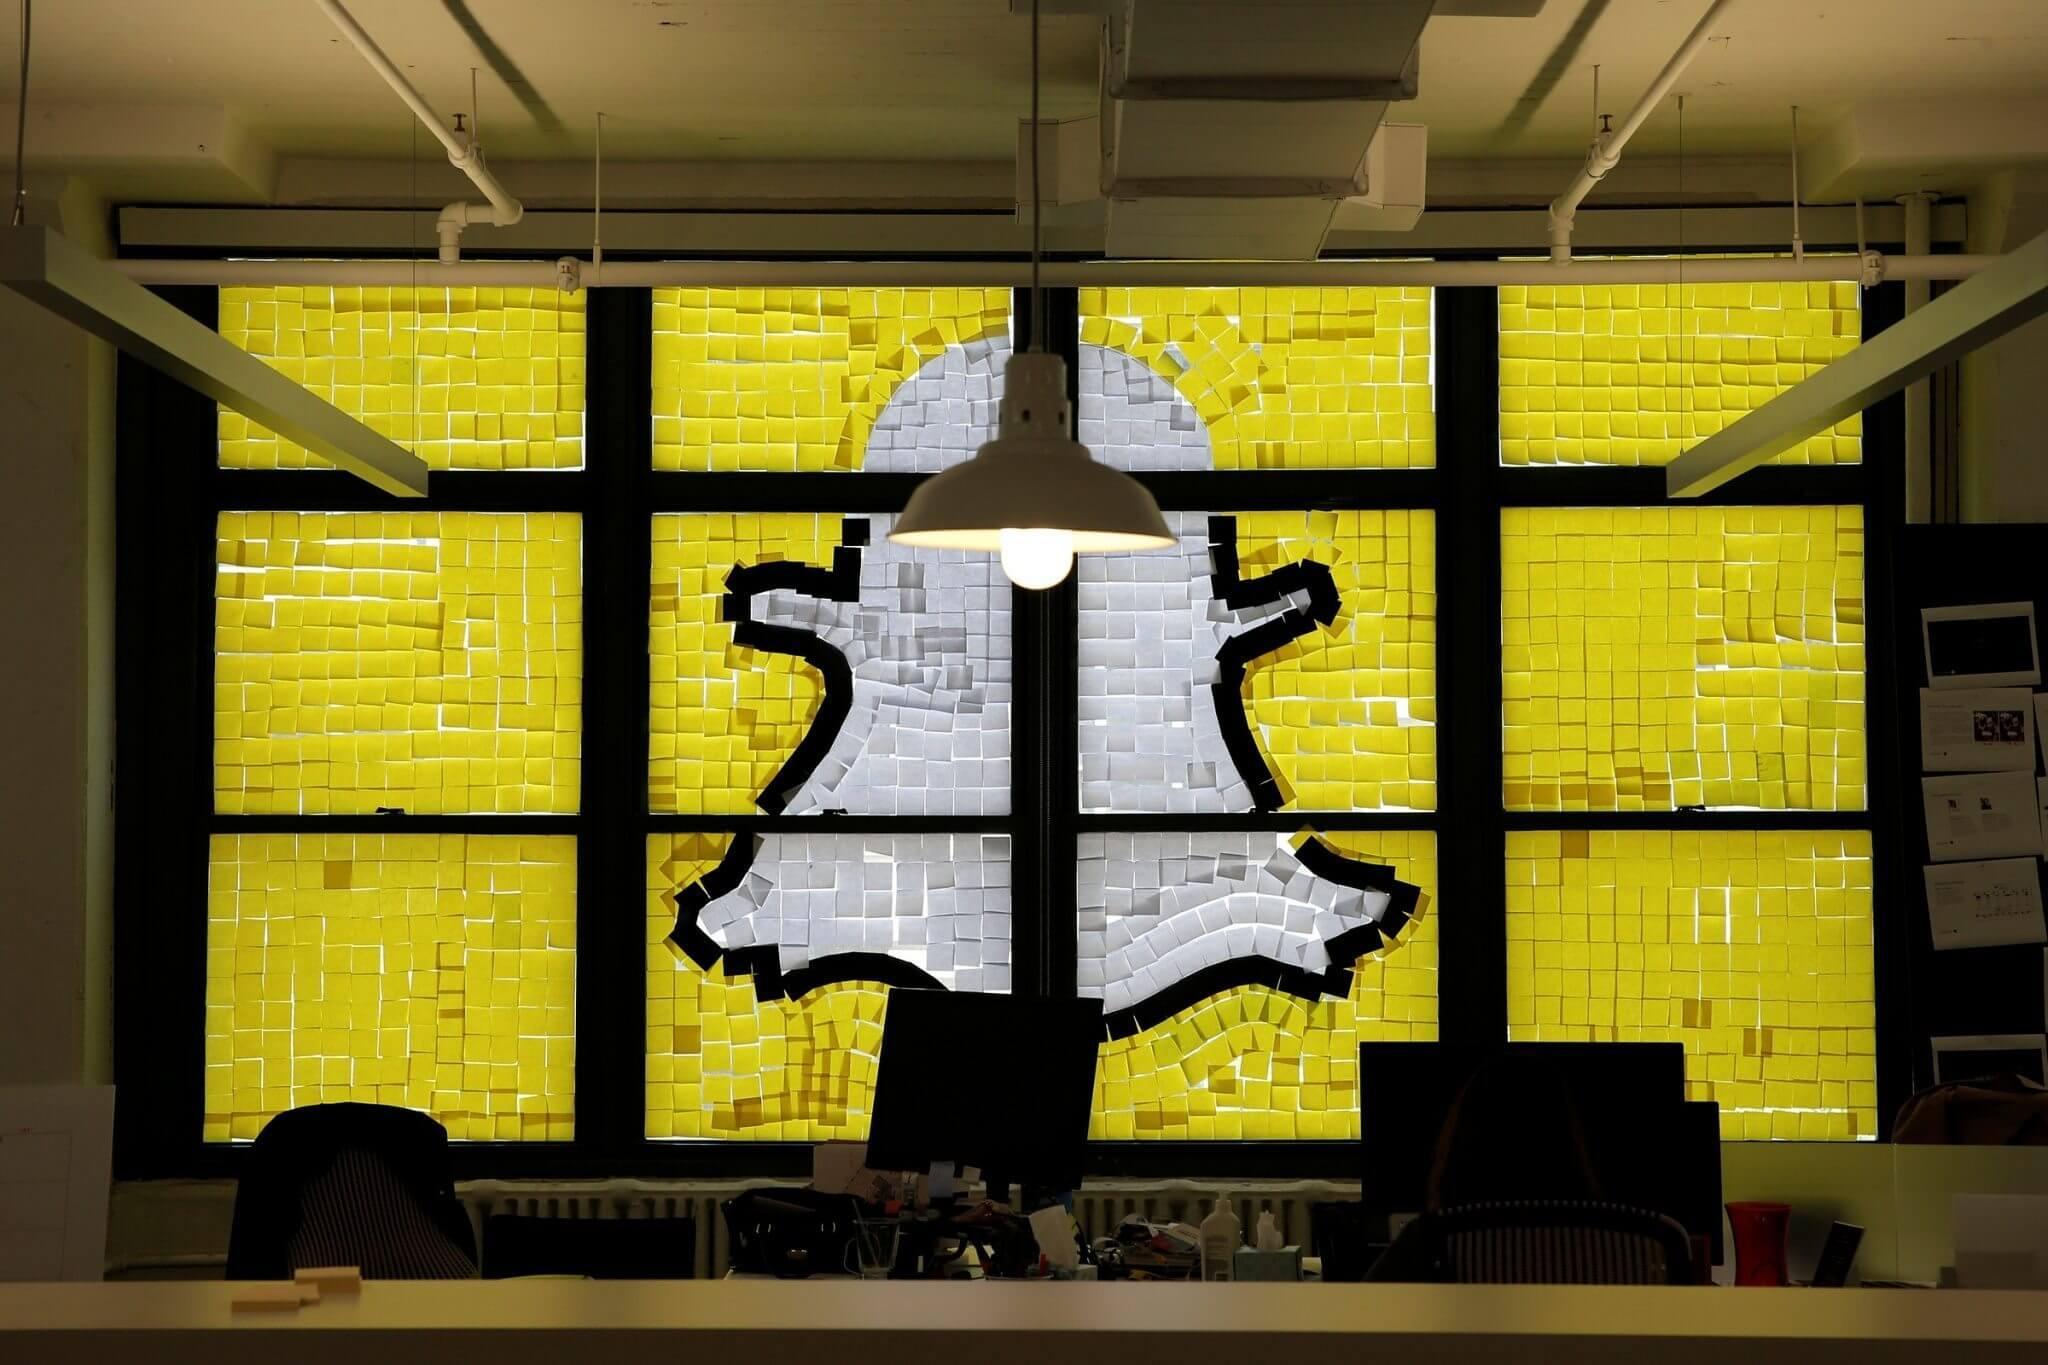 Snapchat processado